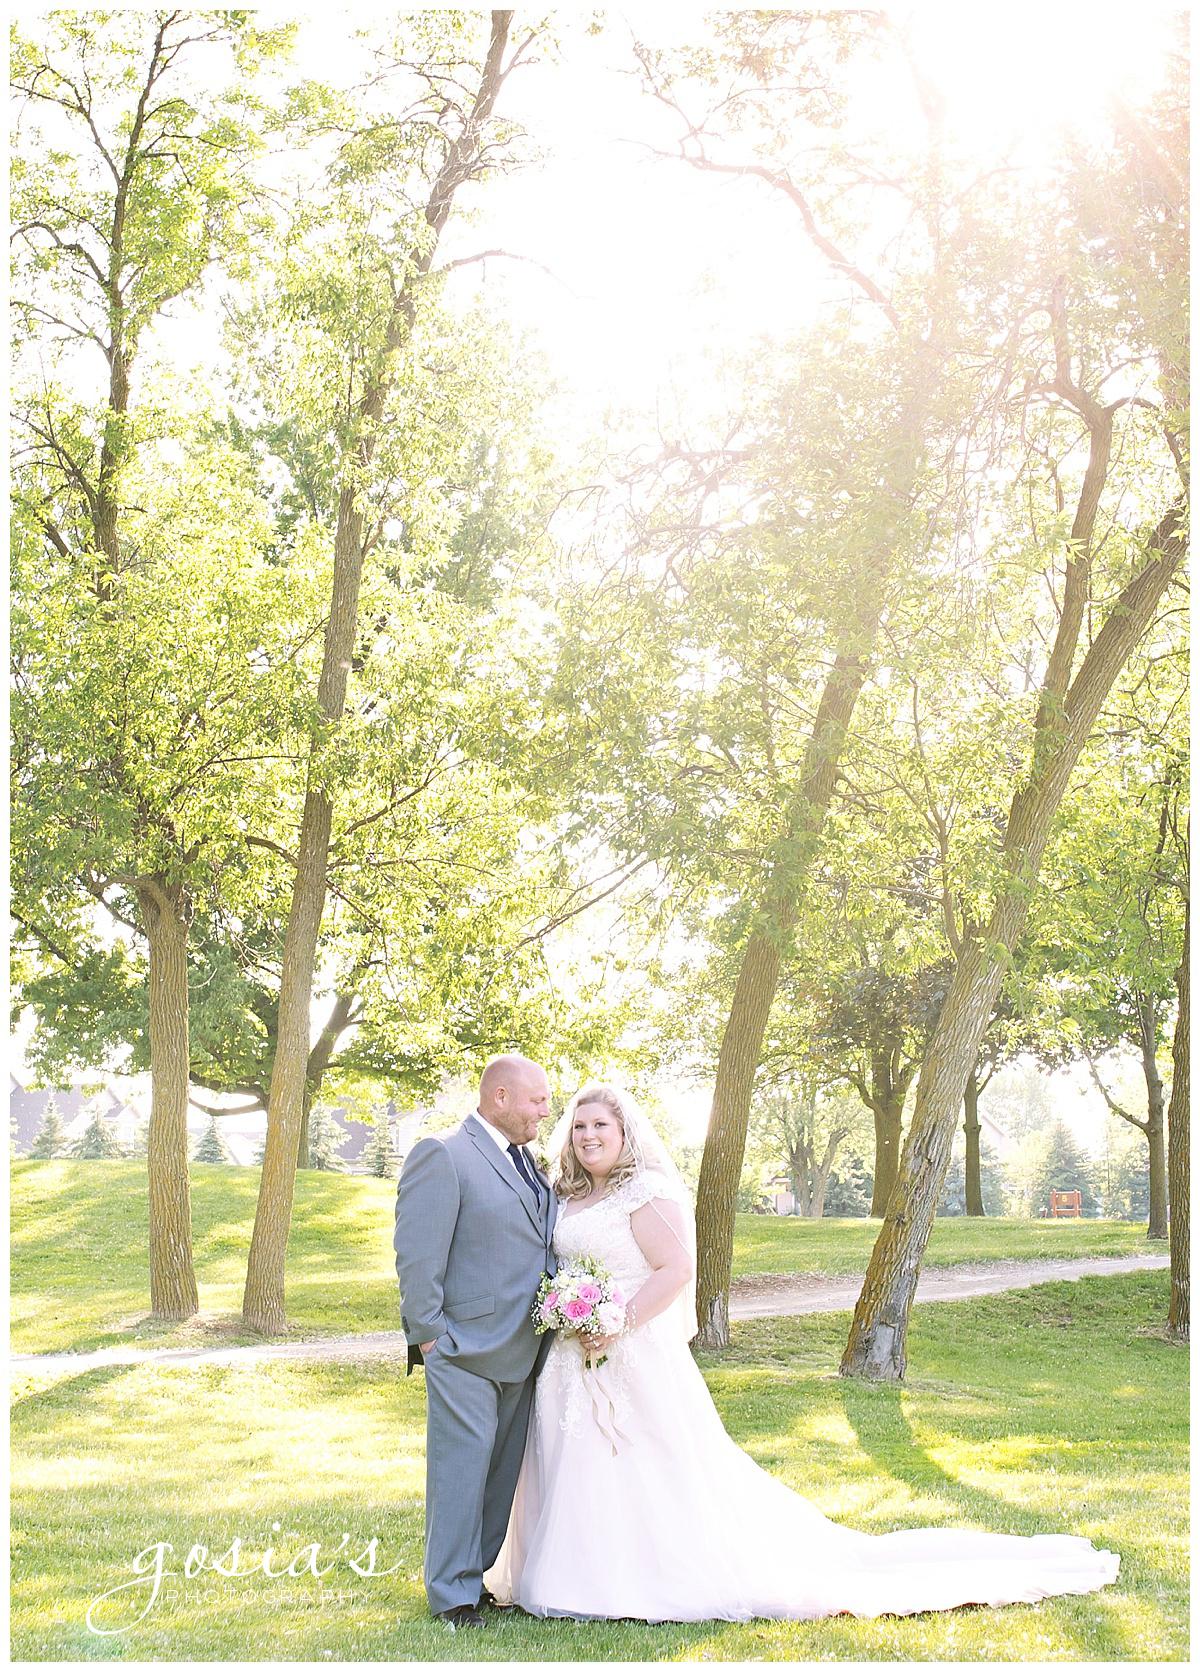 Gosias-Photography-wedding-photographer-Appleton-Bridgewood-Hotel-Neenah-Steph-Jason-00.jpg